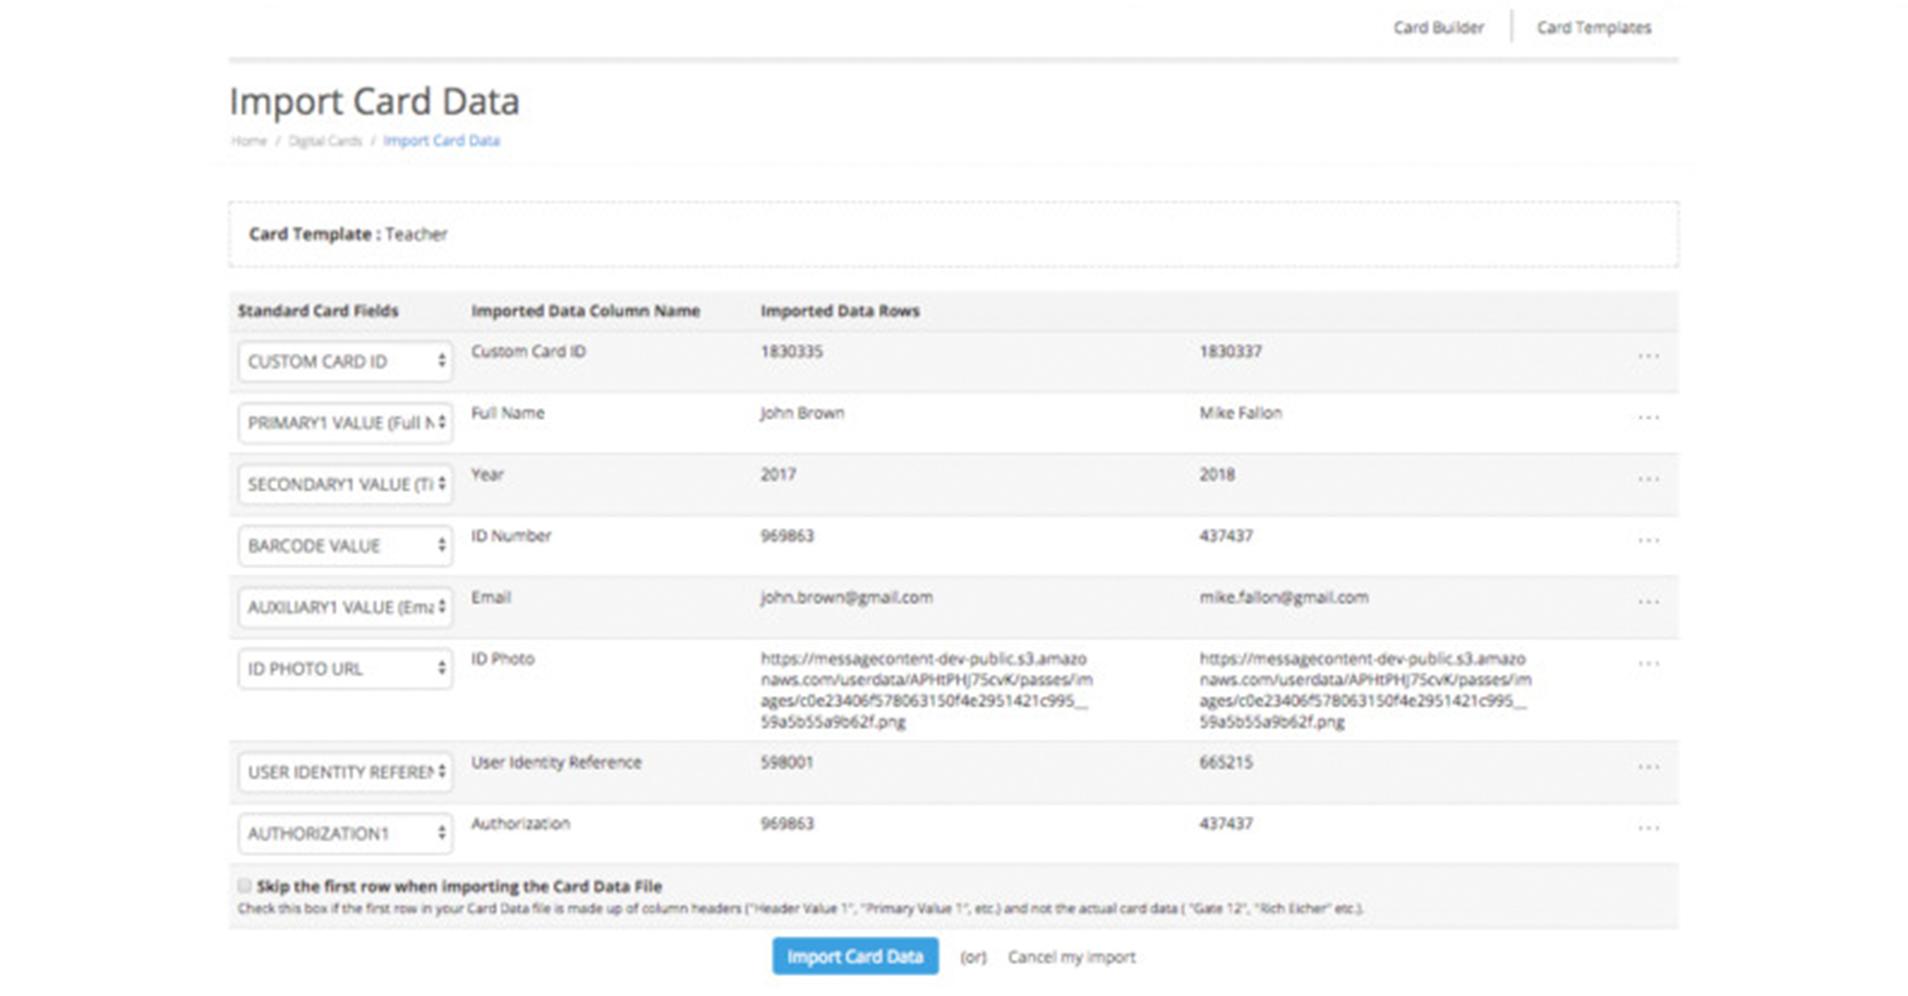 import-card-data